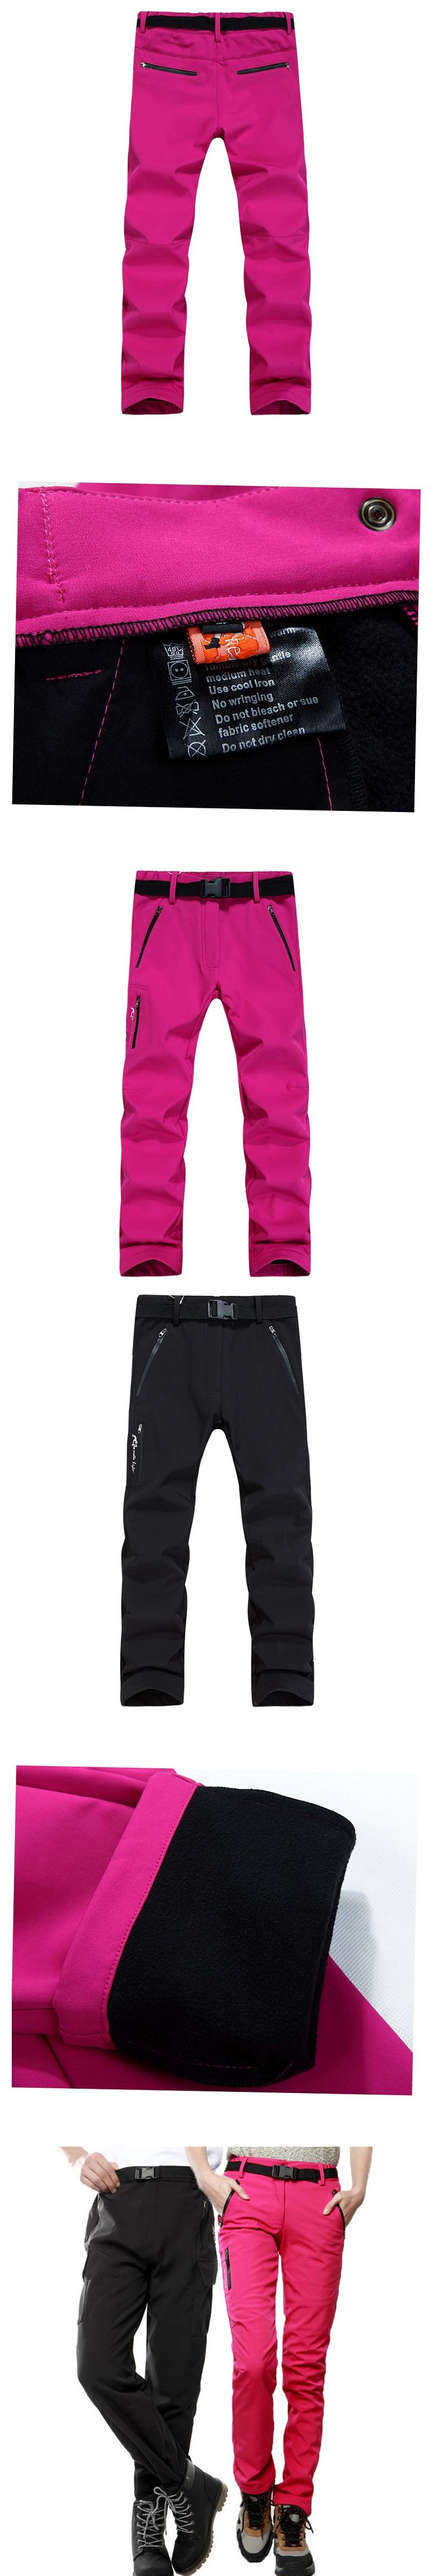 Outdoor Pants Ski Pants Winter Autumn Wind And Waterproof Hiking Climbing Fishing Sport Trousers